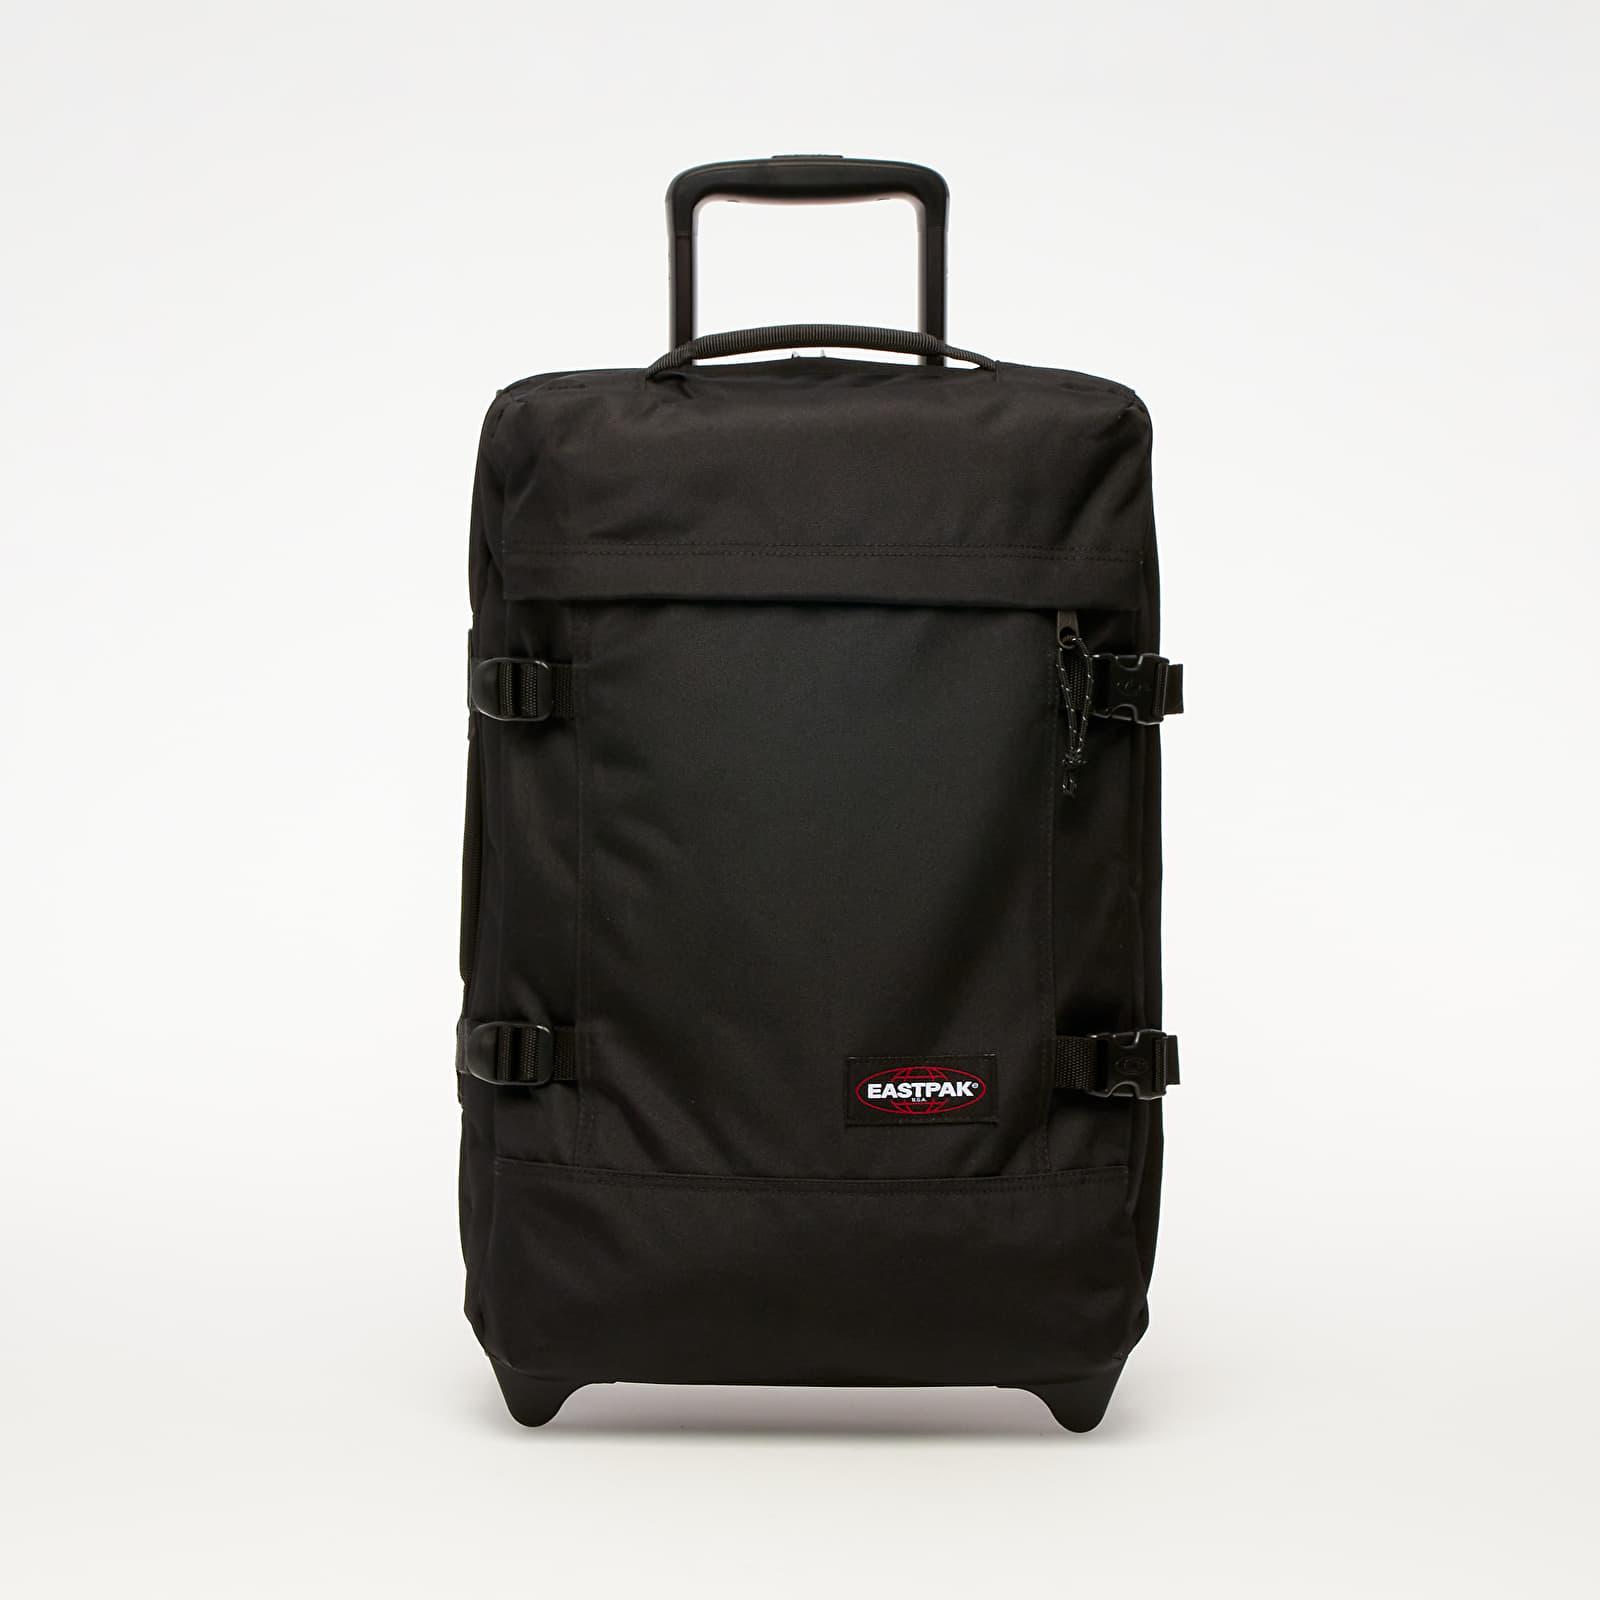 Mochilas y bolsas Eastpak Tranverz S Travel Bag Black